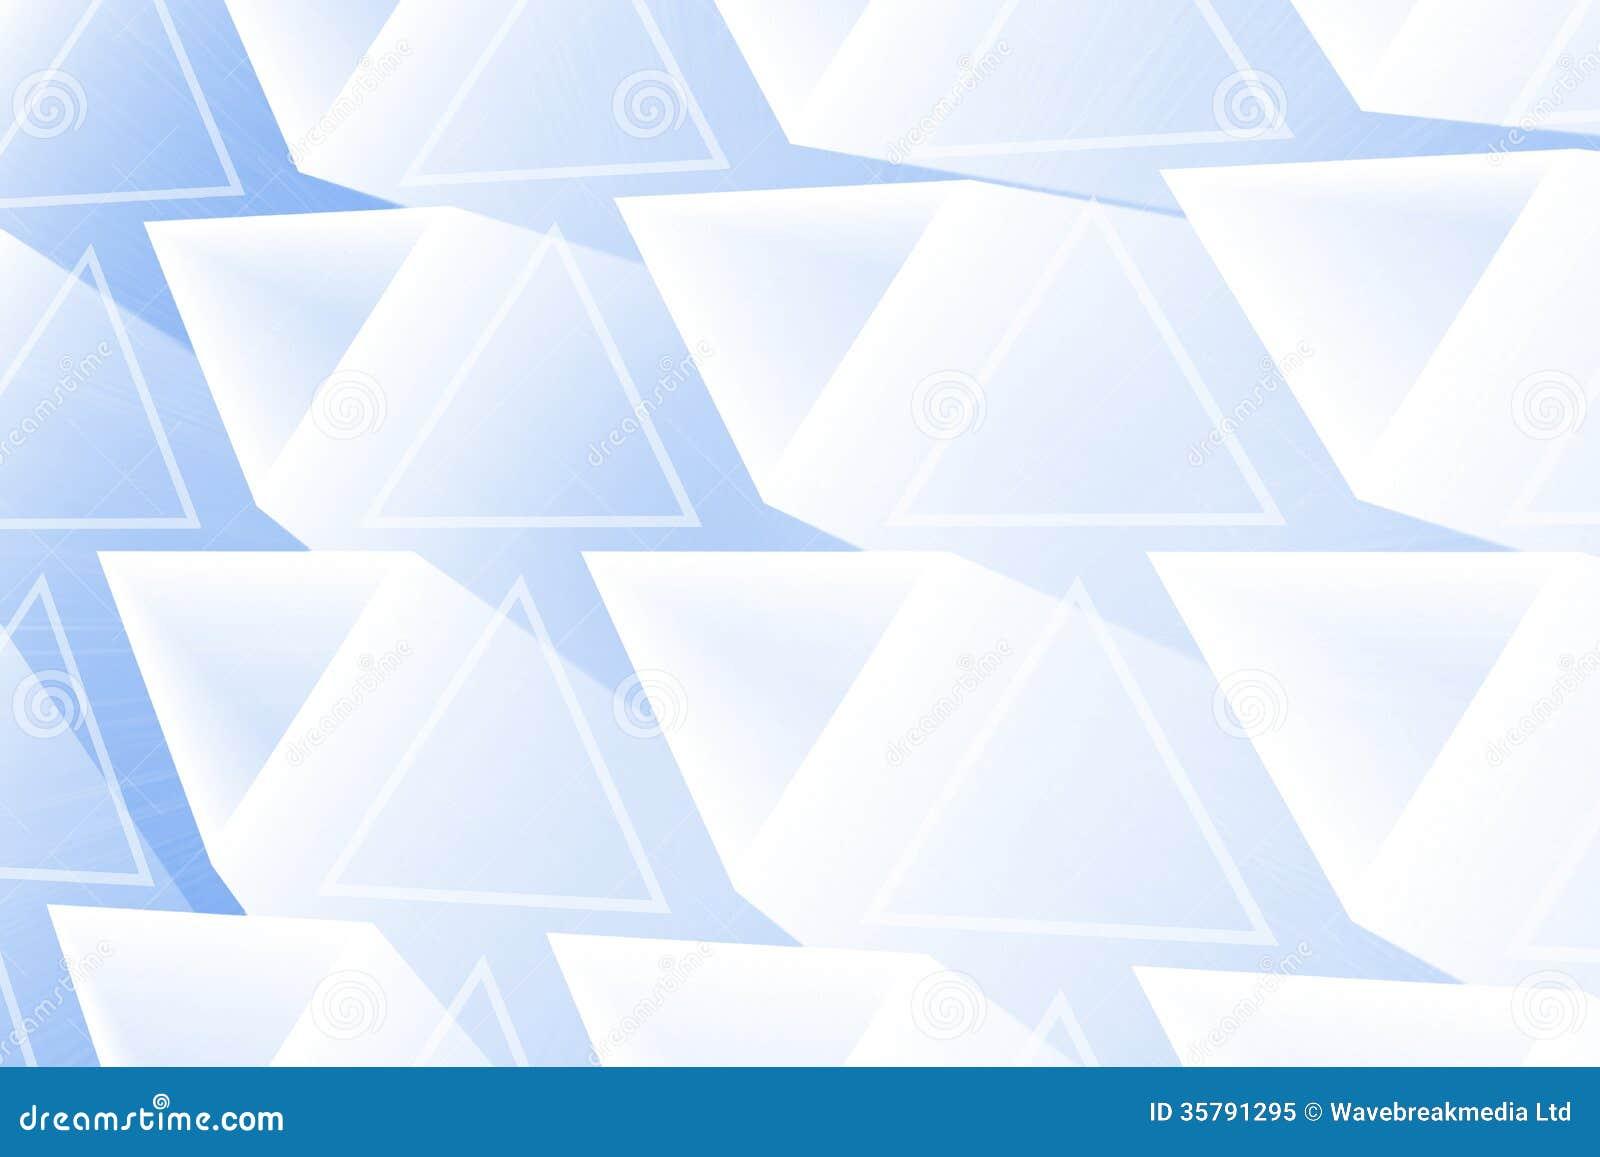 Abstrakte glühende Dreiecke